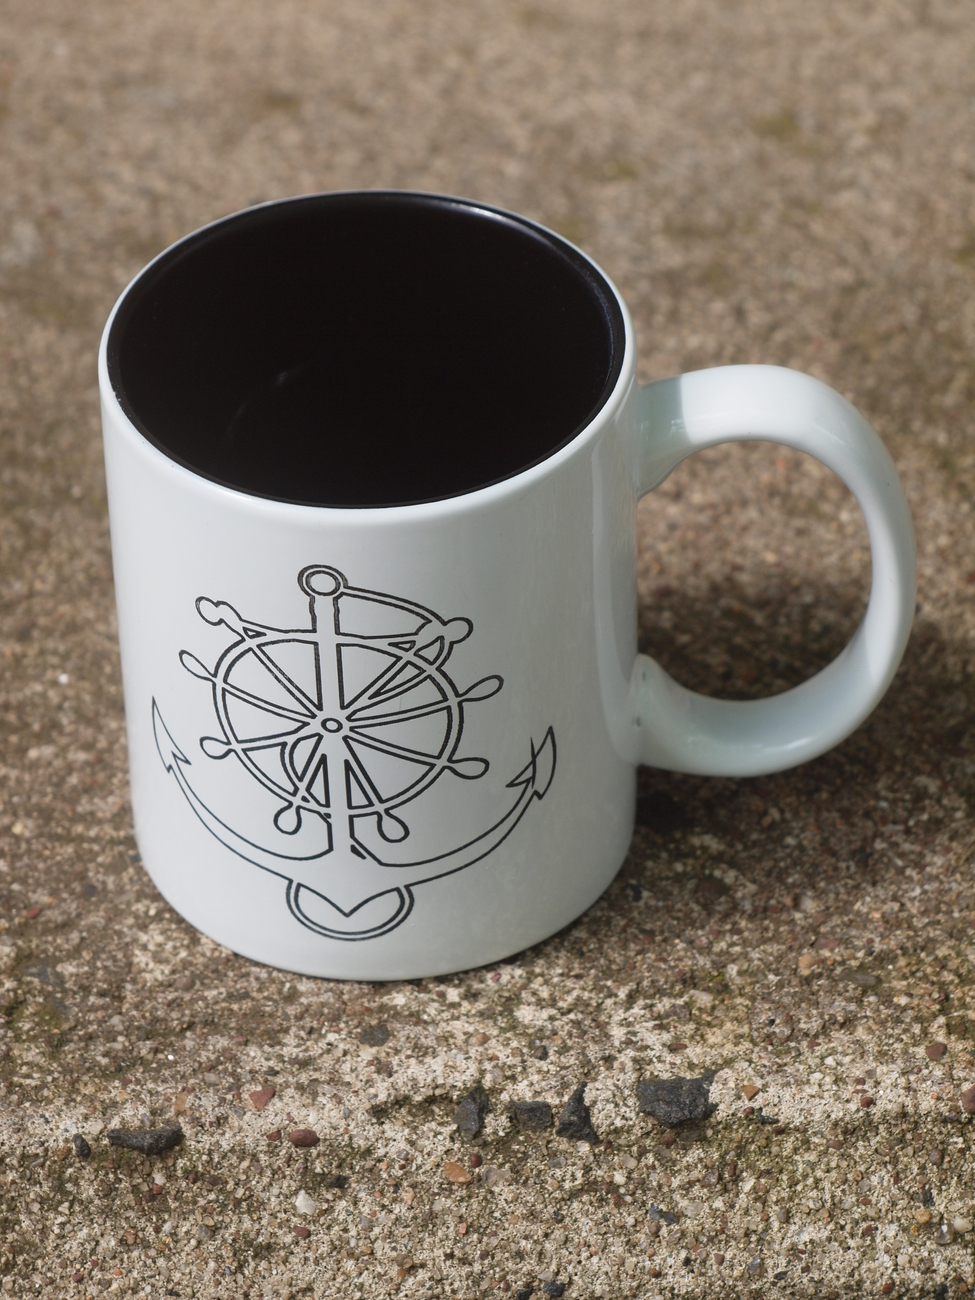 11 OZ WHITE COFFE MUG WITH NAUTICAL MOTIF